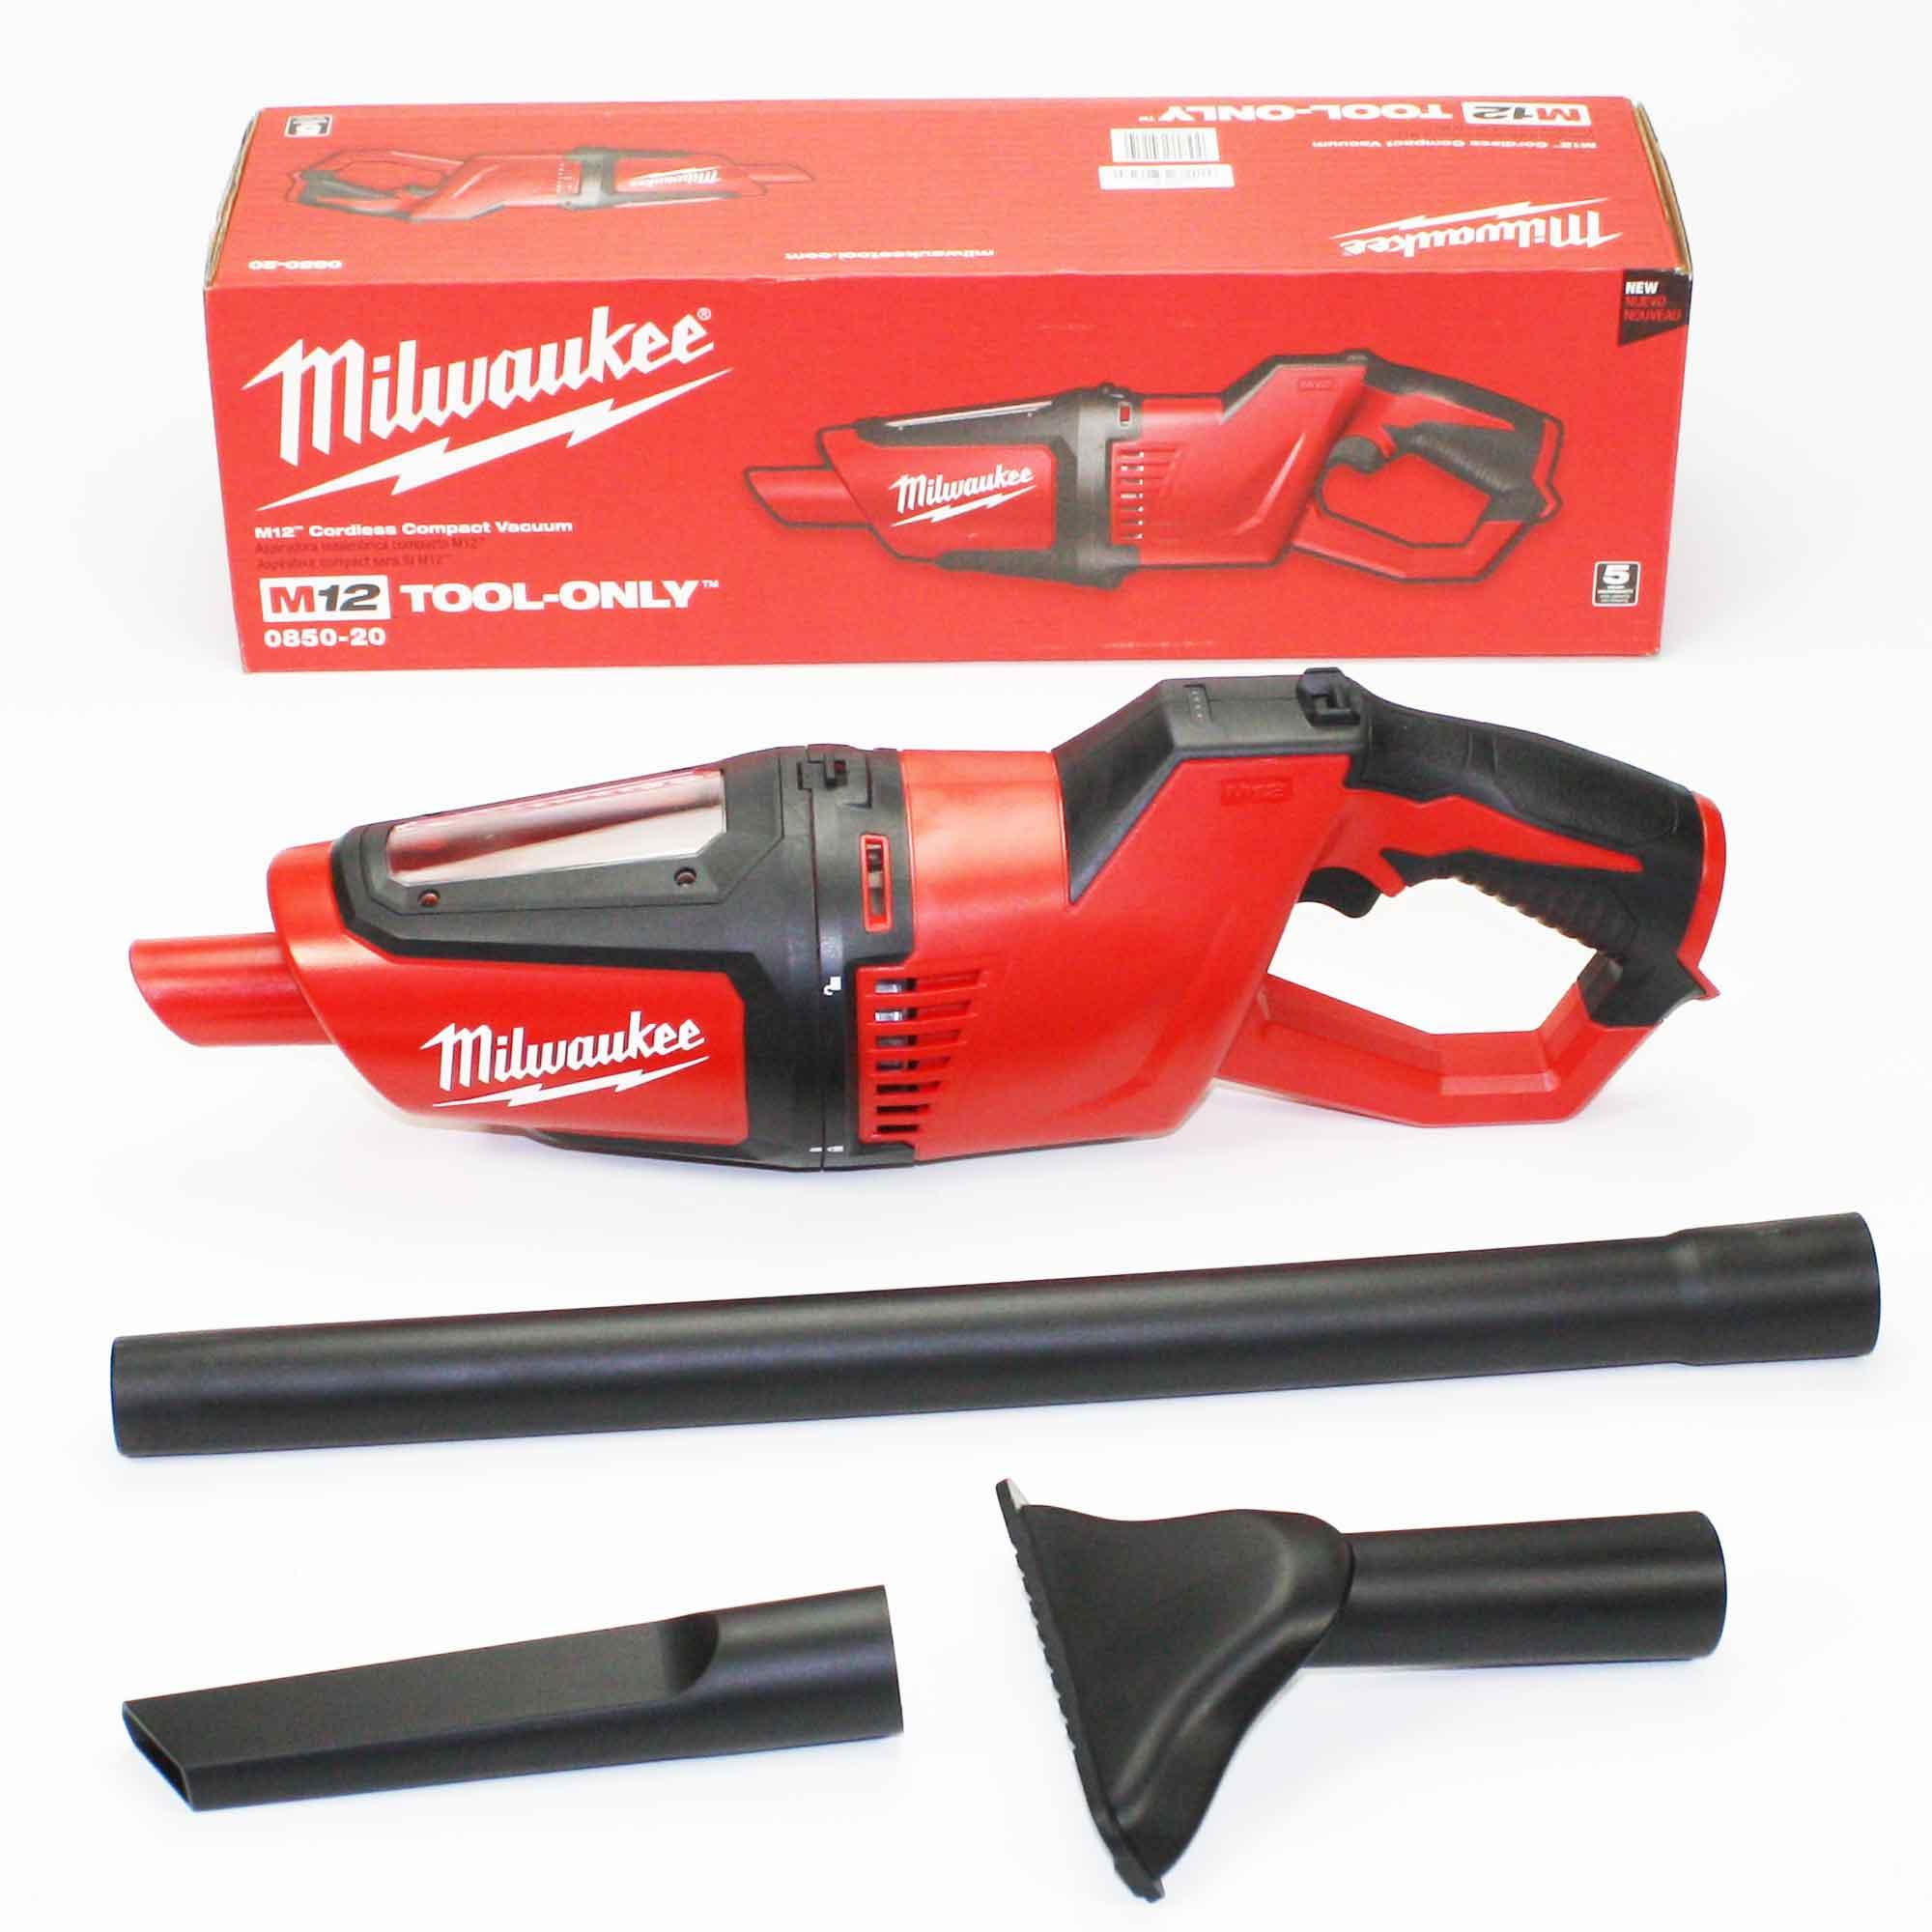 0850-20 Milwaukee M12 Vac-Tool Only